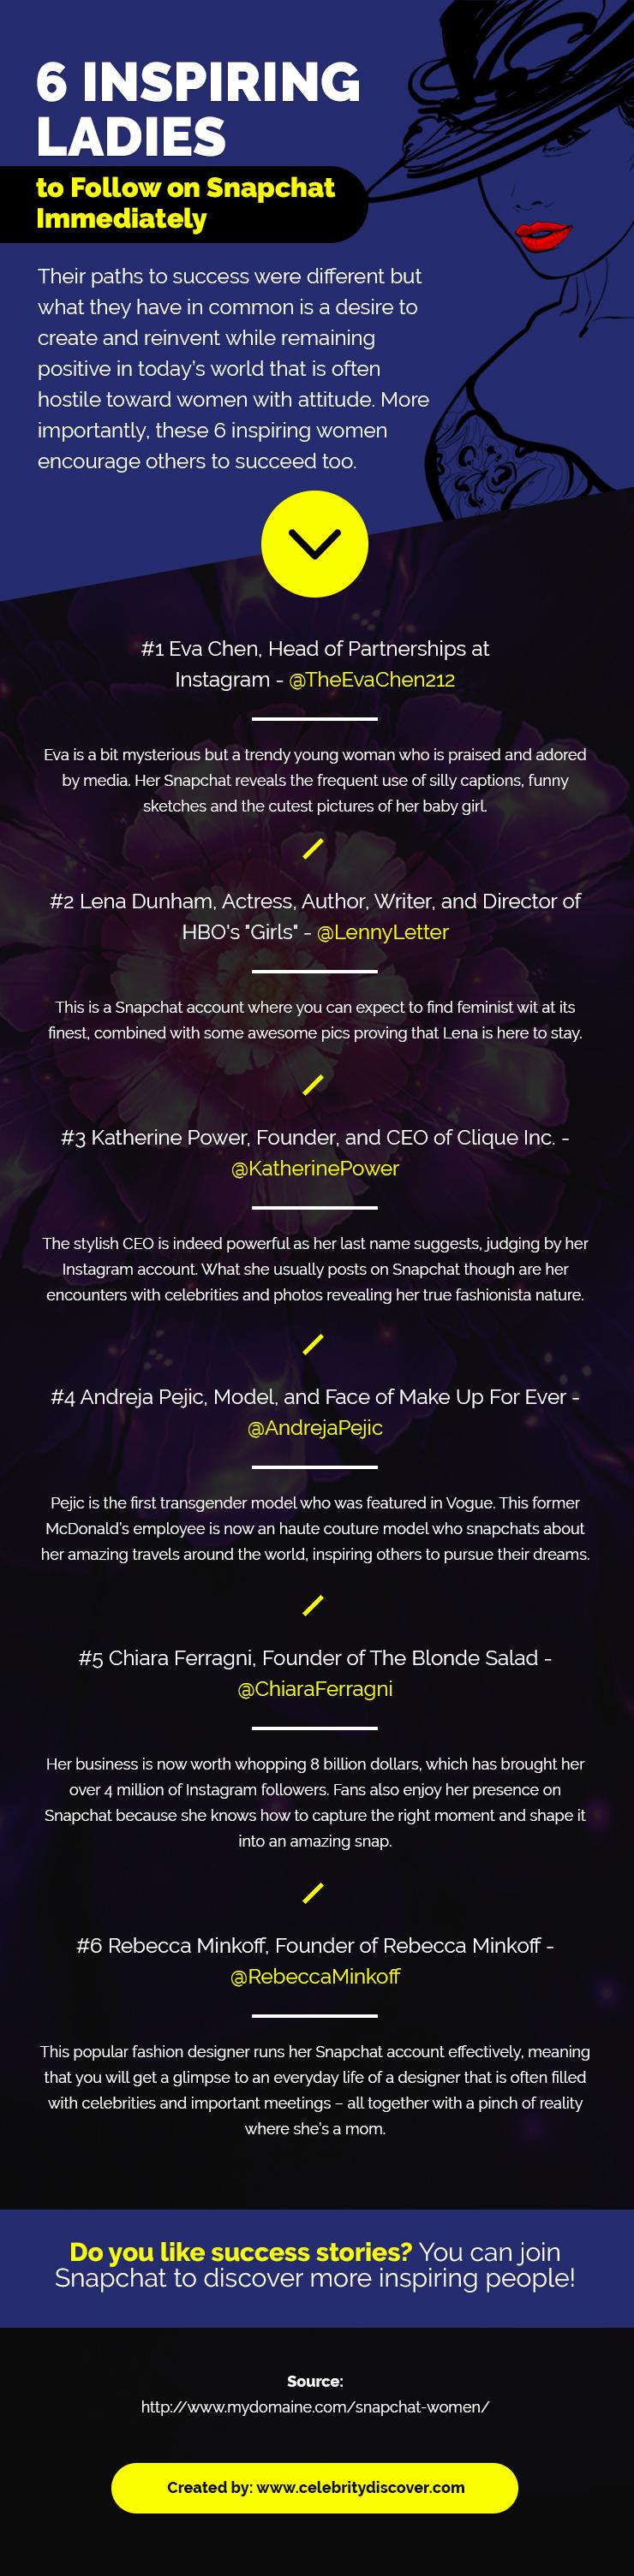 6 Inspiring Ladies to Follow on Snapchat Immediately